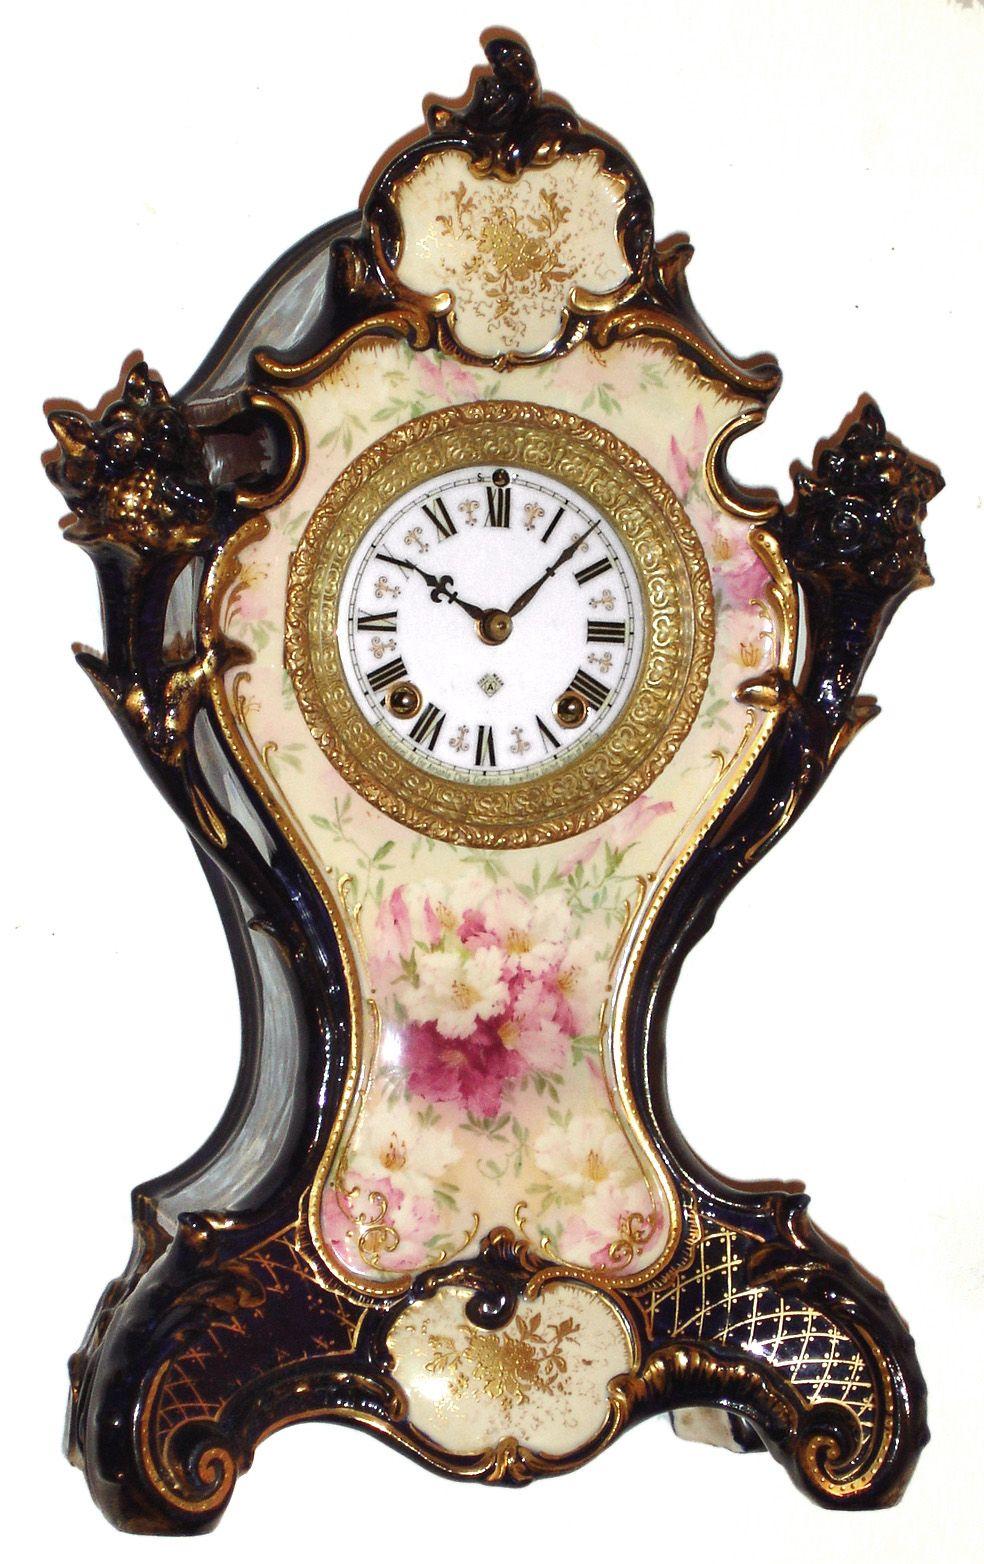 Antique Clock Details Clock Vintage Clock Antique Clocks